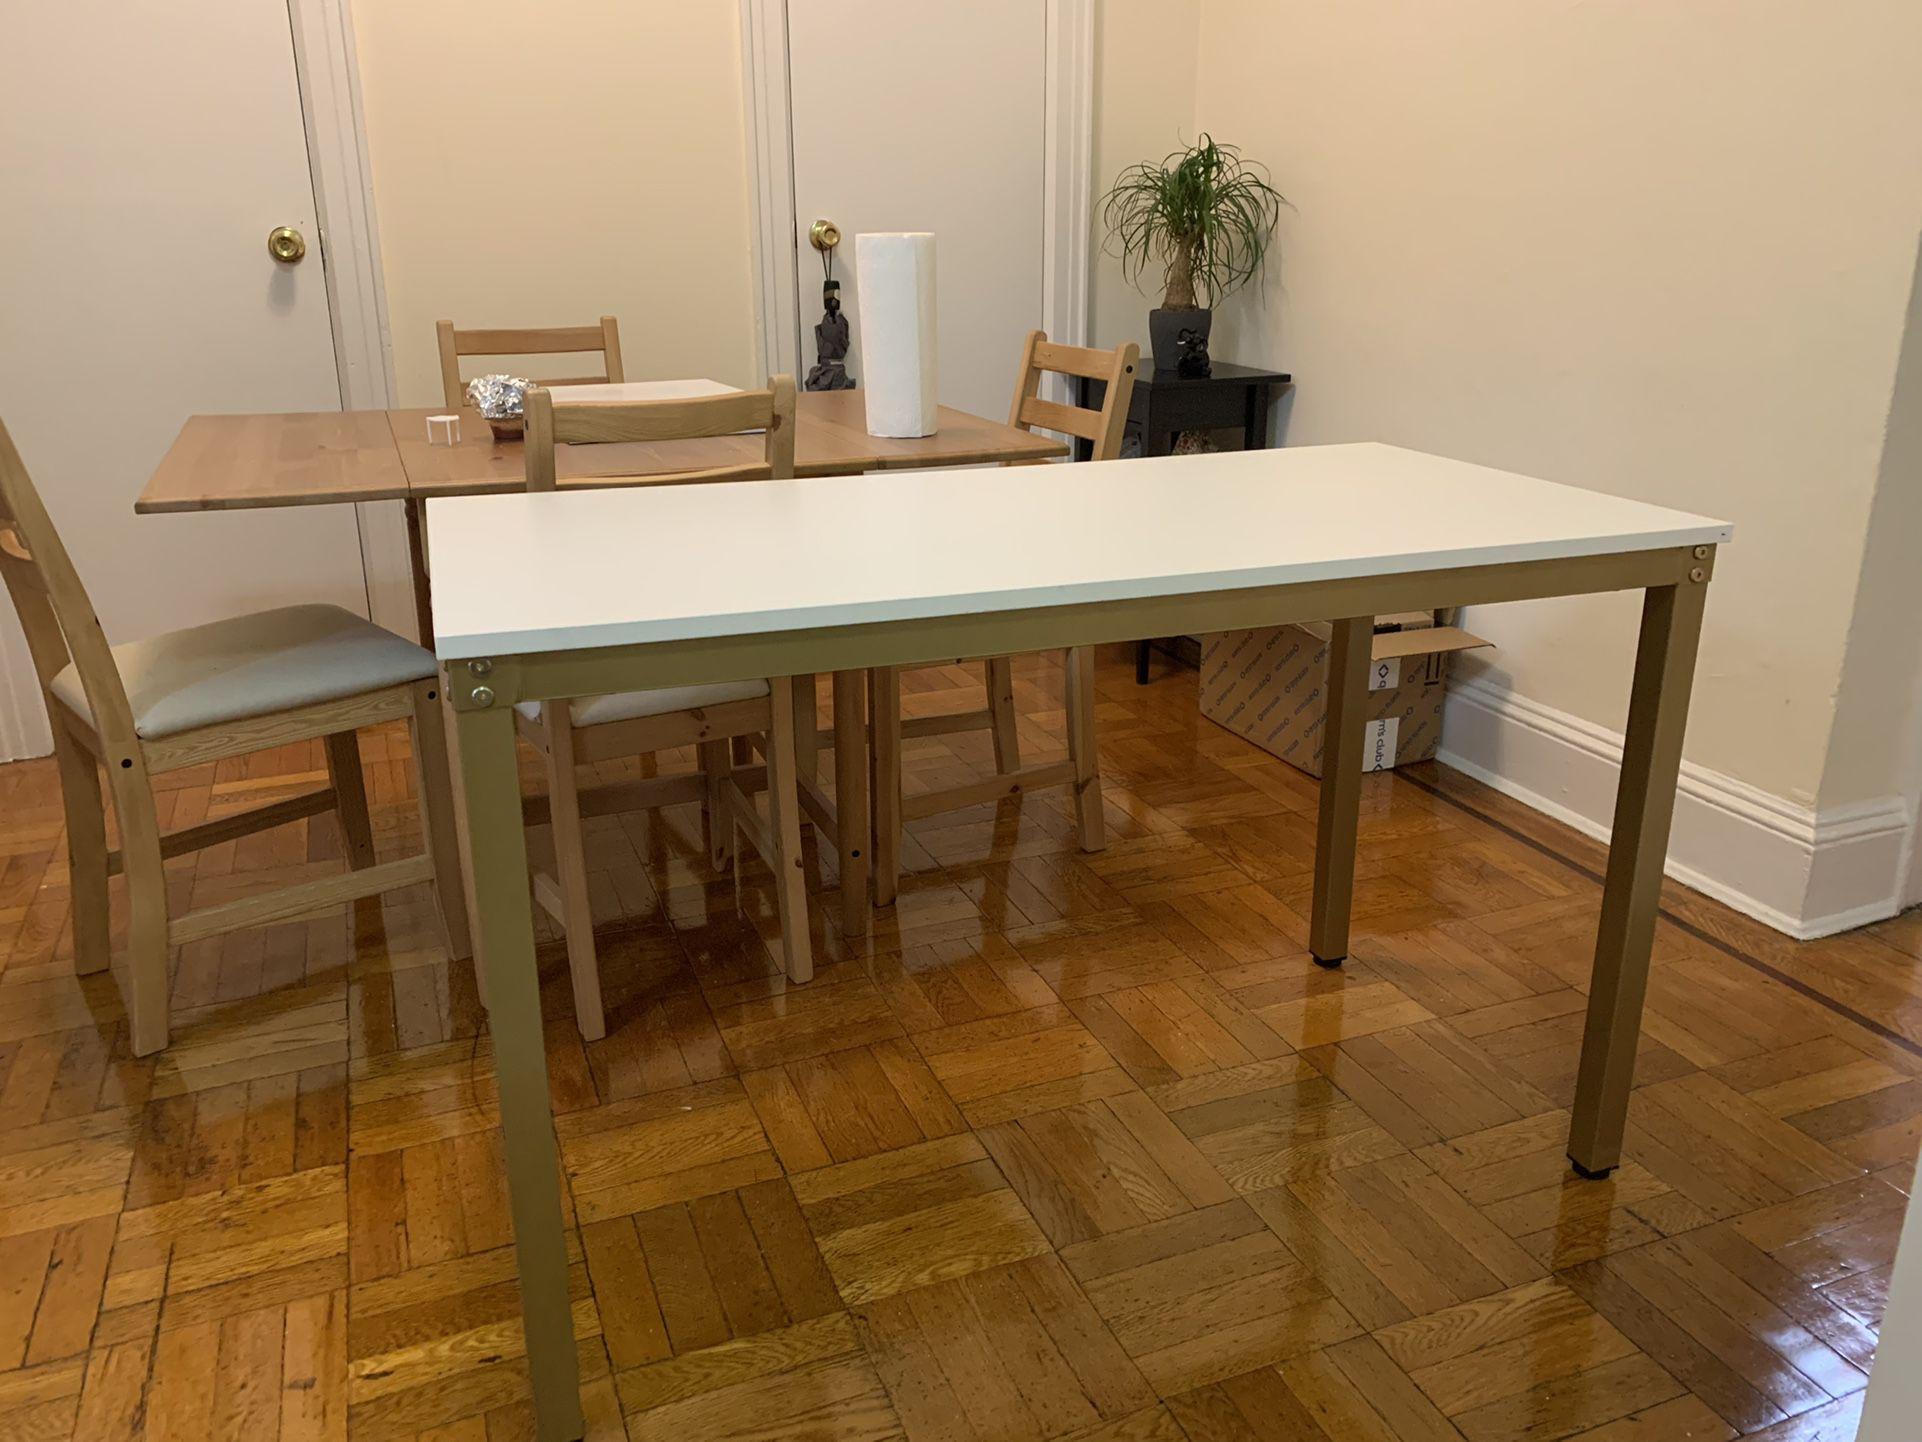 LIKE NEW WORK DESK TABLE